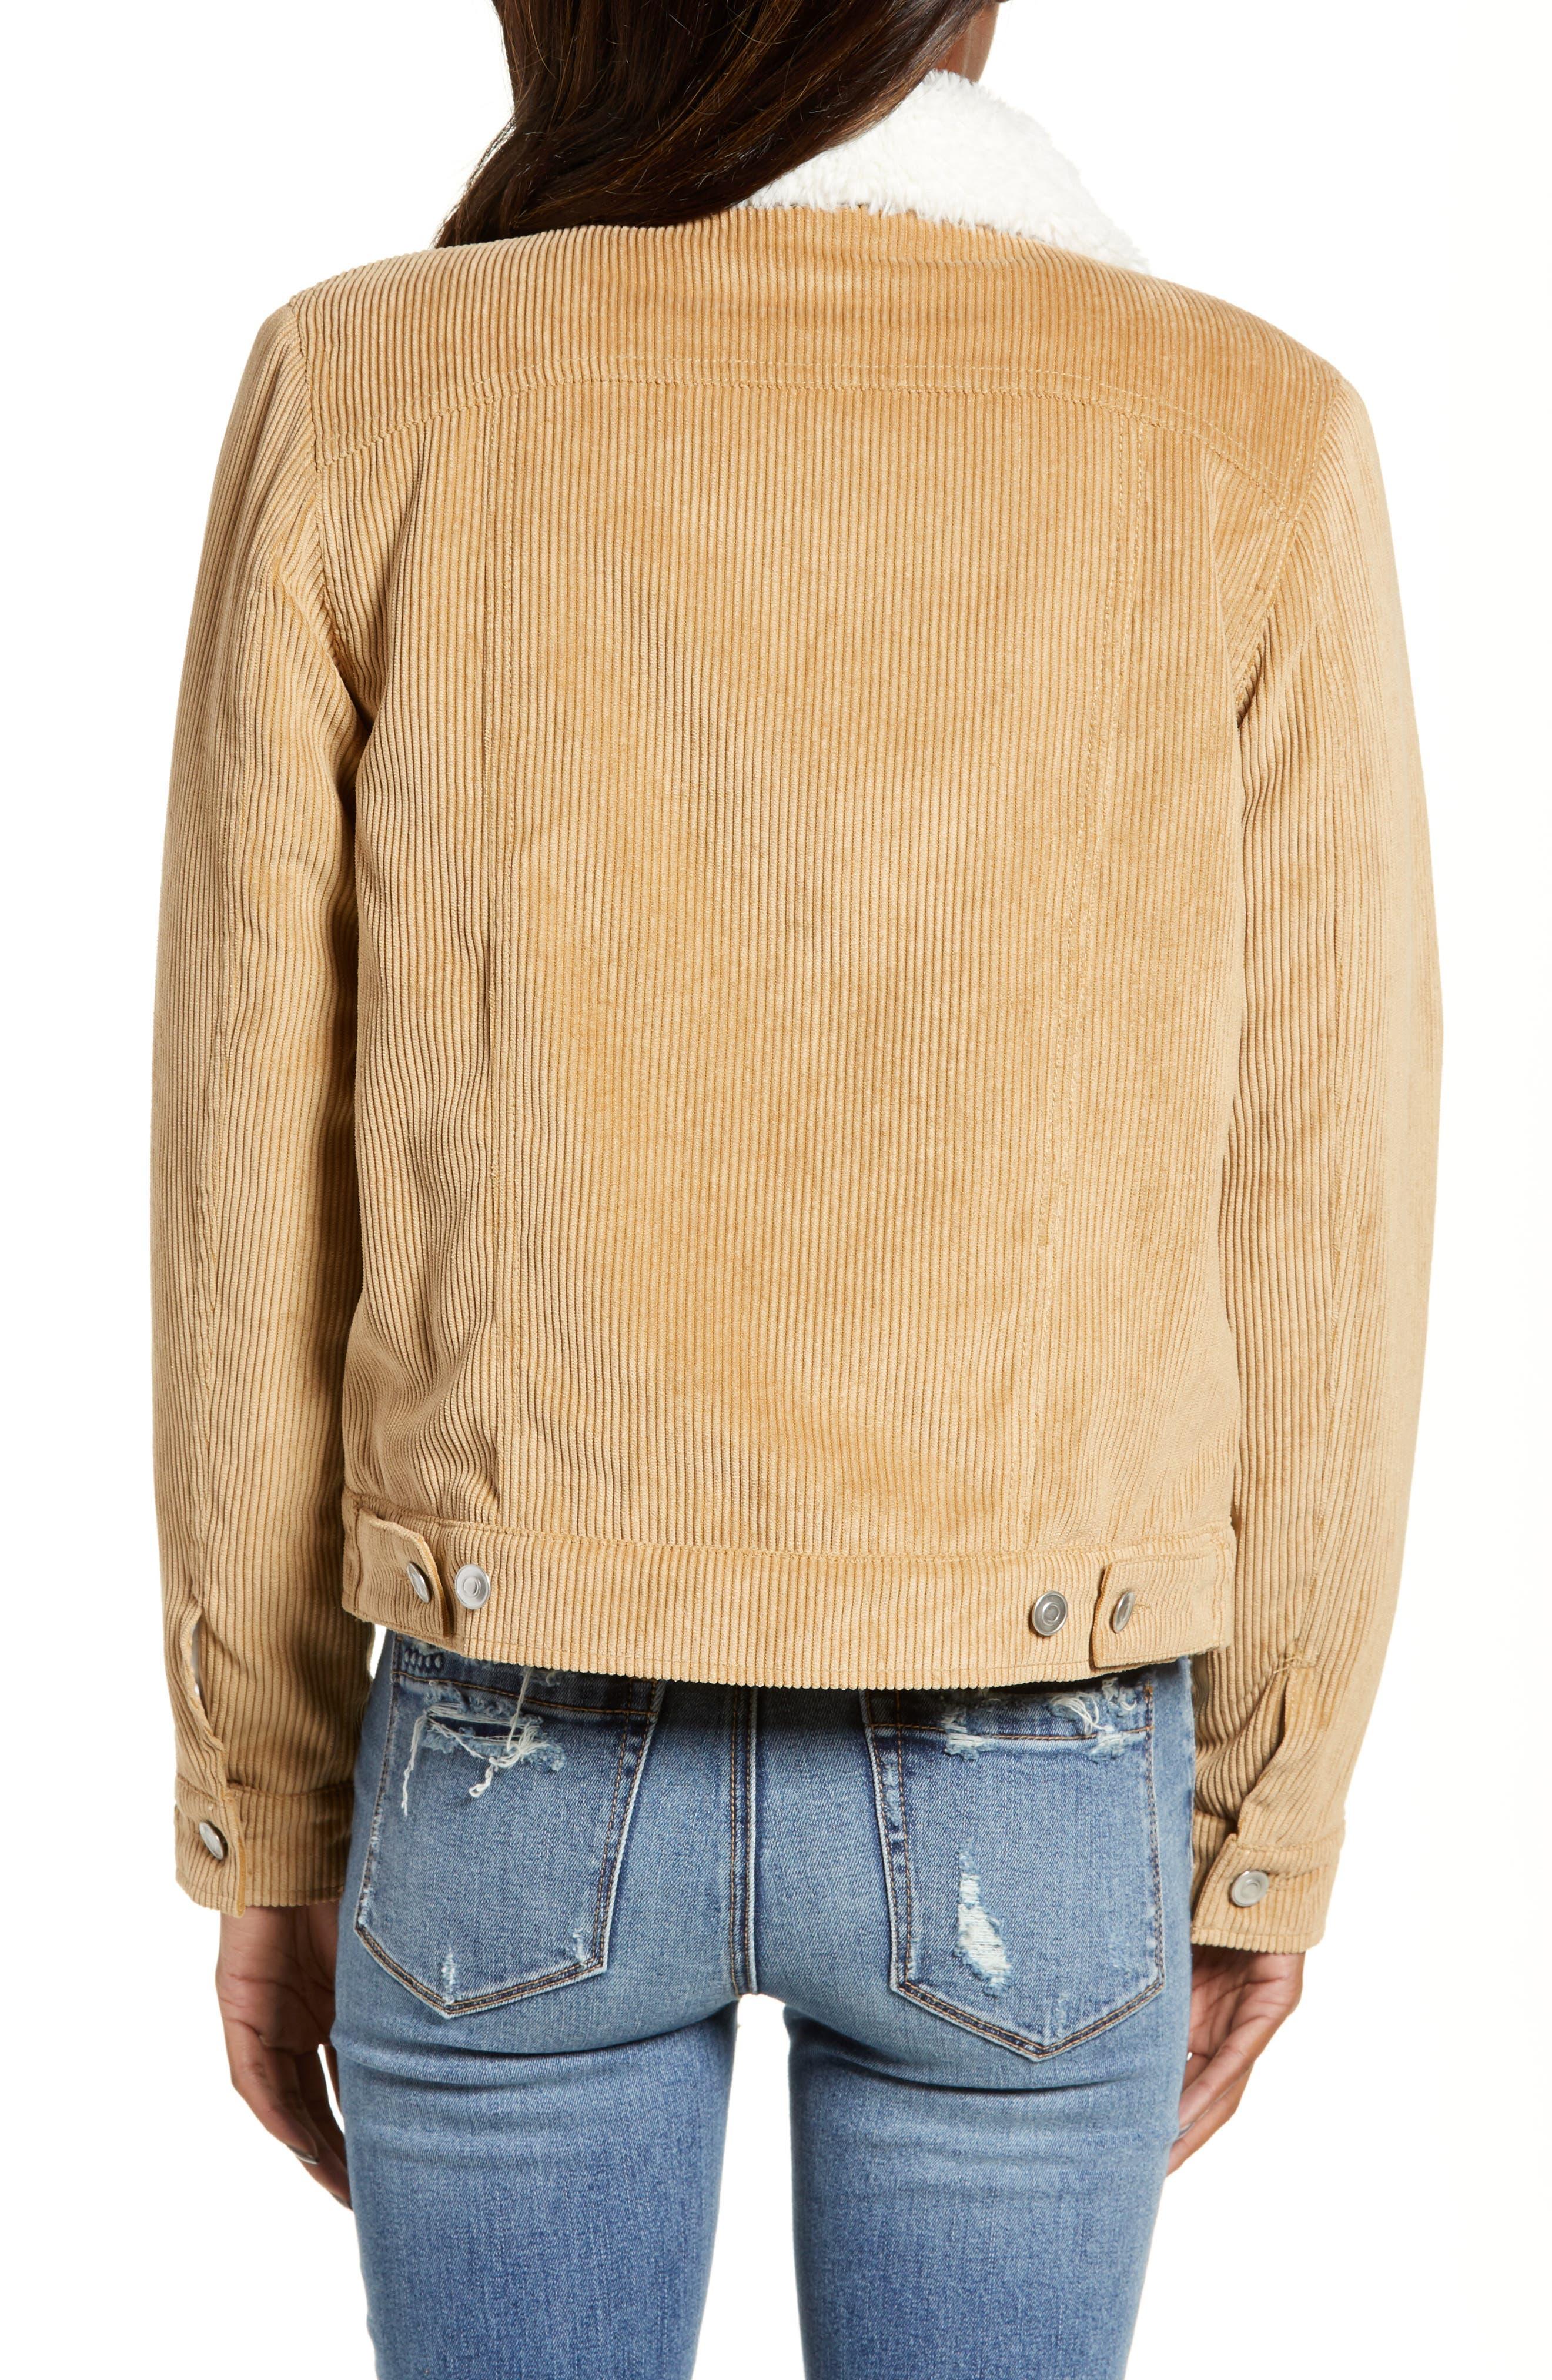 THREAD & SUPPLY, Paddington Fleece Lined Corduroy Jacket, Alternate thumbnail 2, color, KHAKI